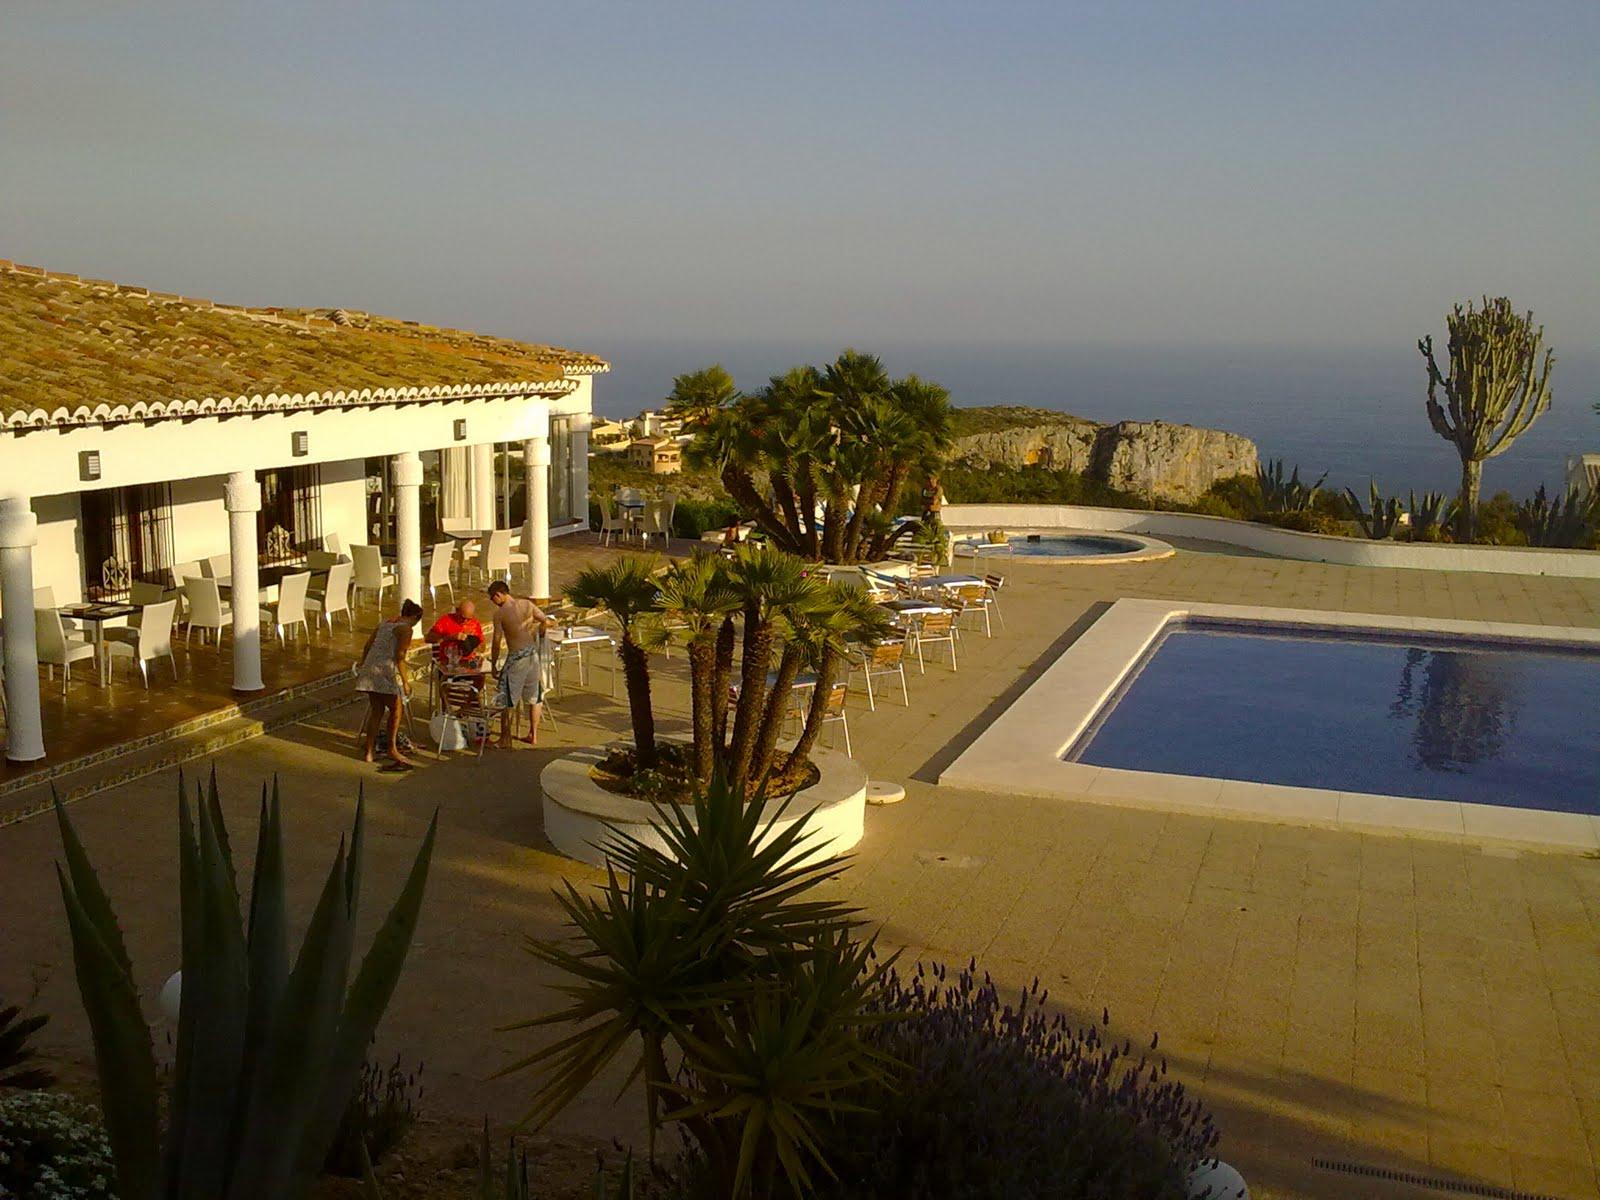 Comer en valencia - Restaurante mediterraneo pinedo ...